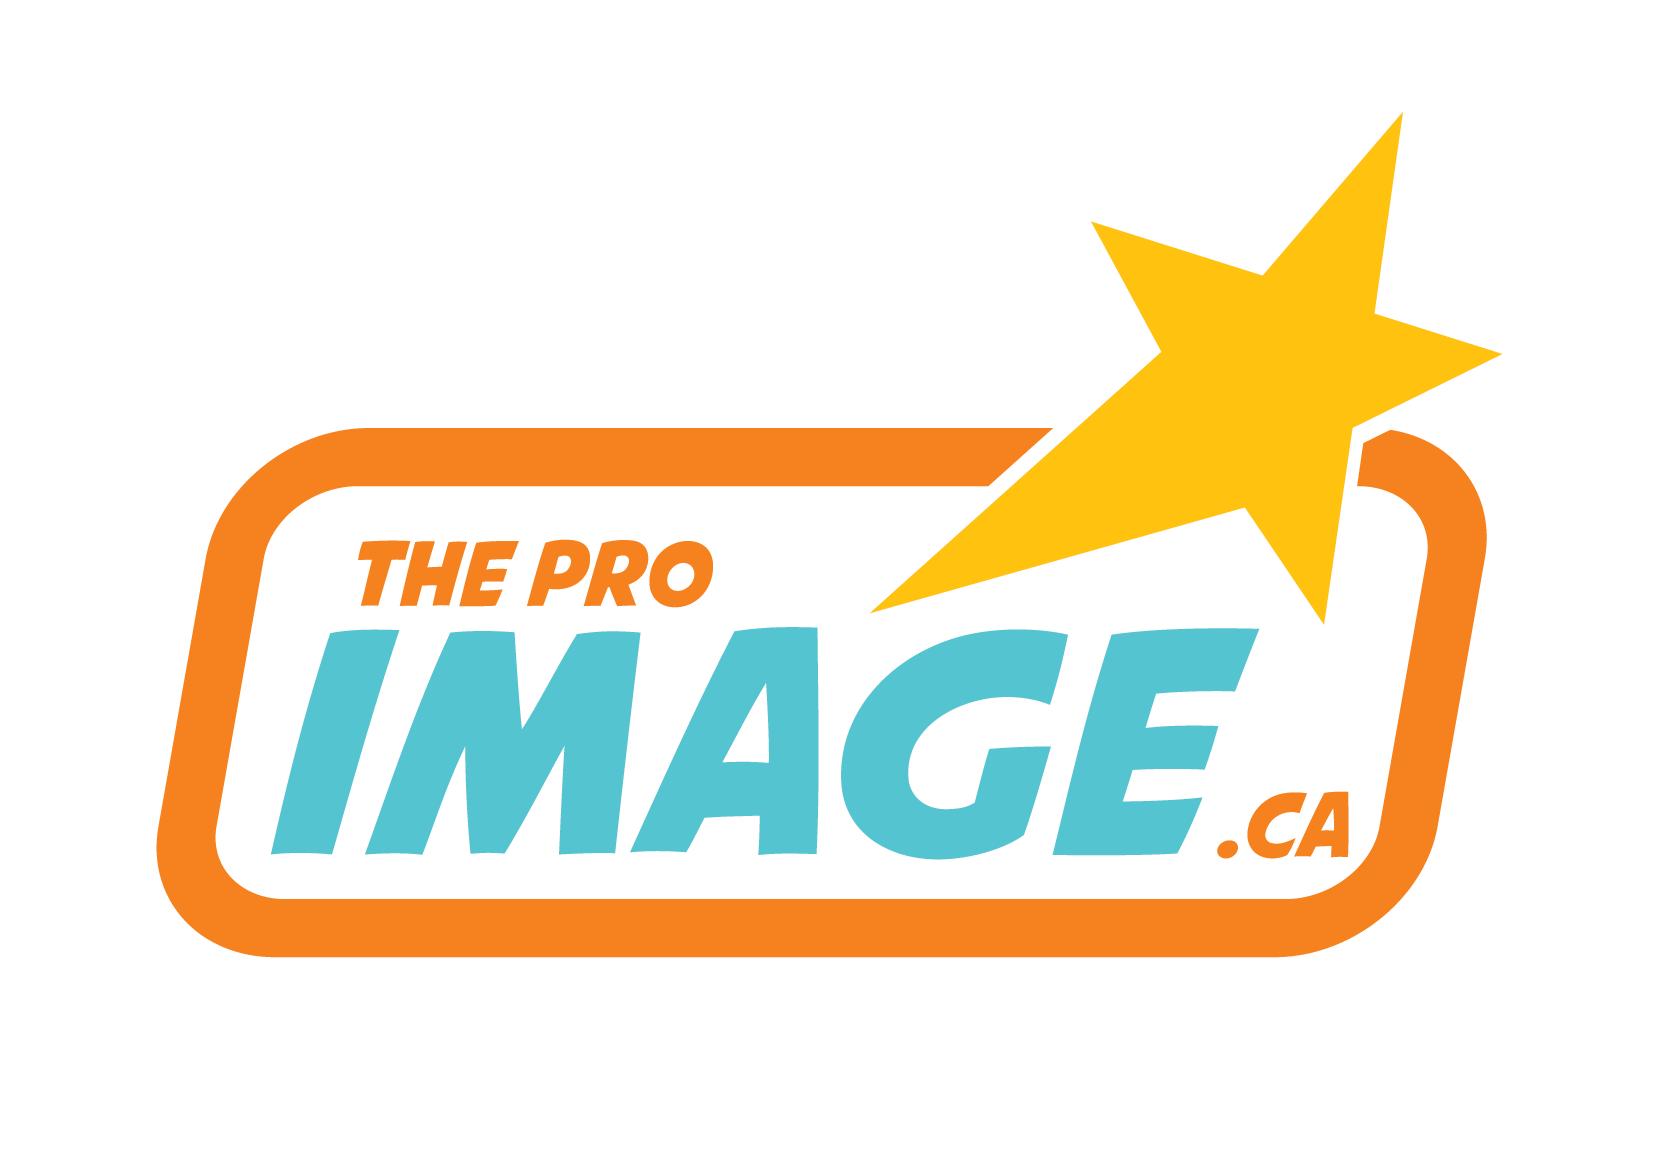 The Pro Image